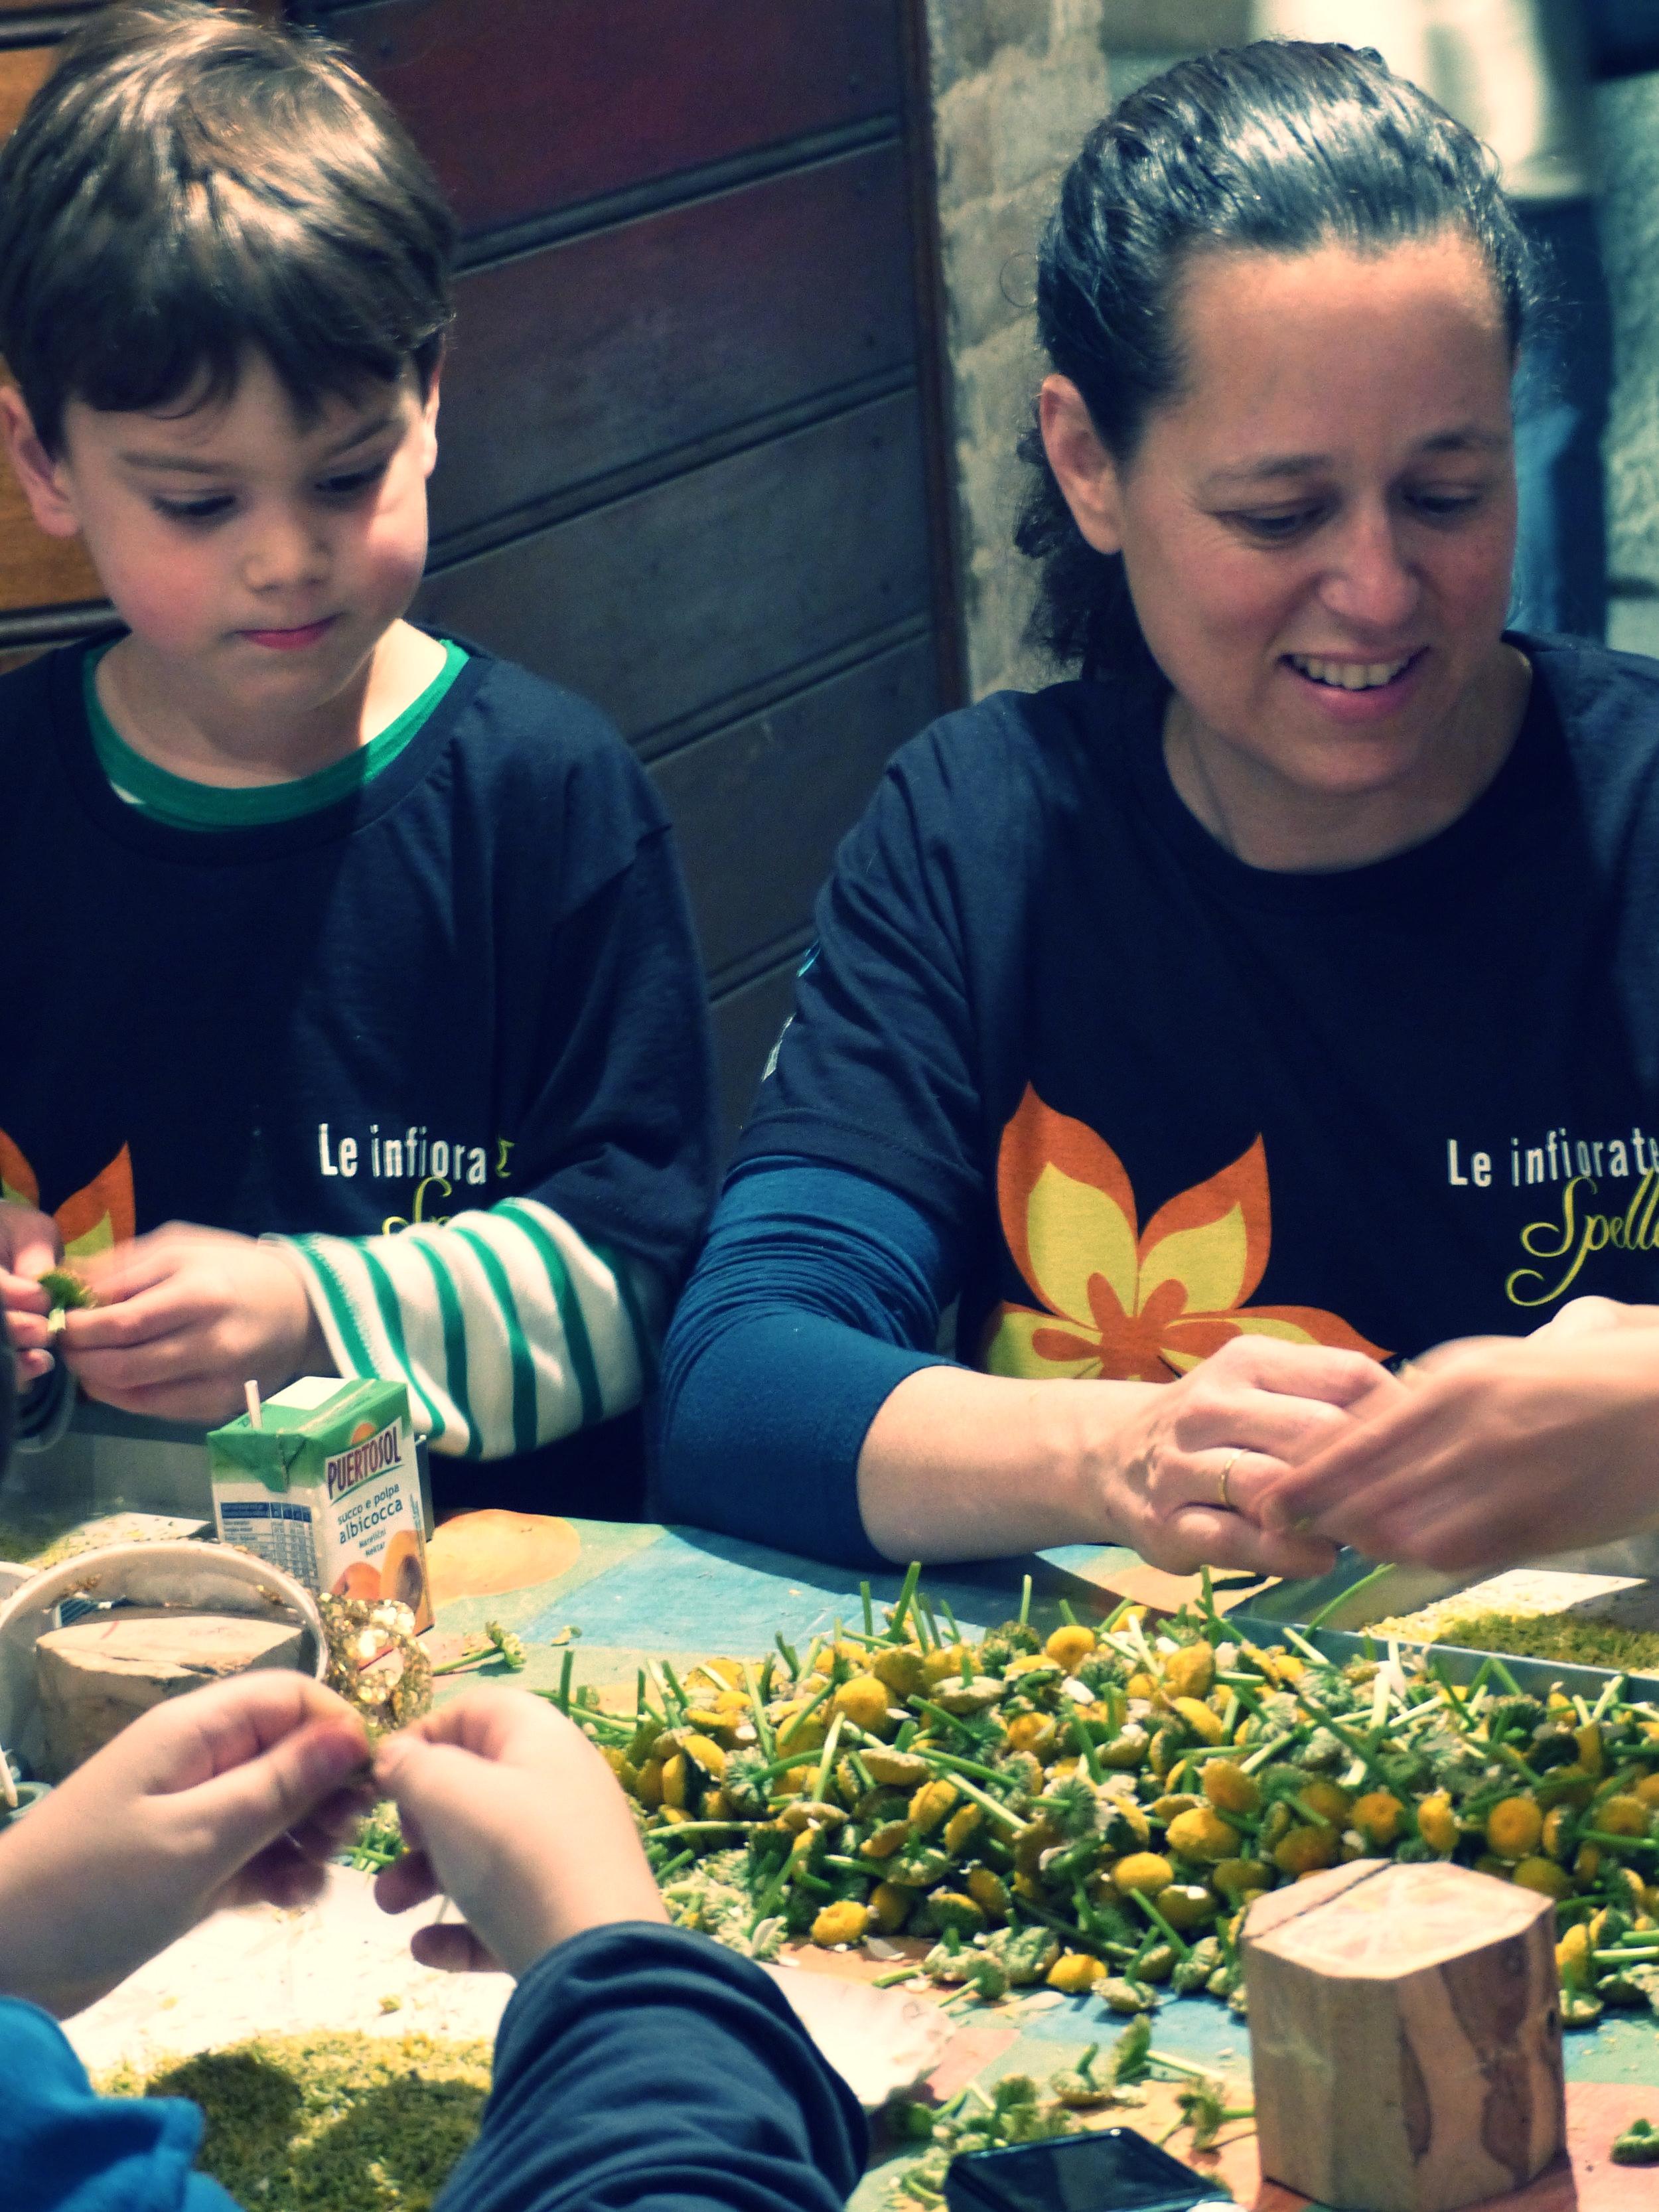 Gabe and Michelle work for Infiorata in Spello, Umbria